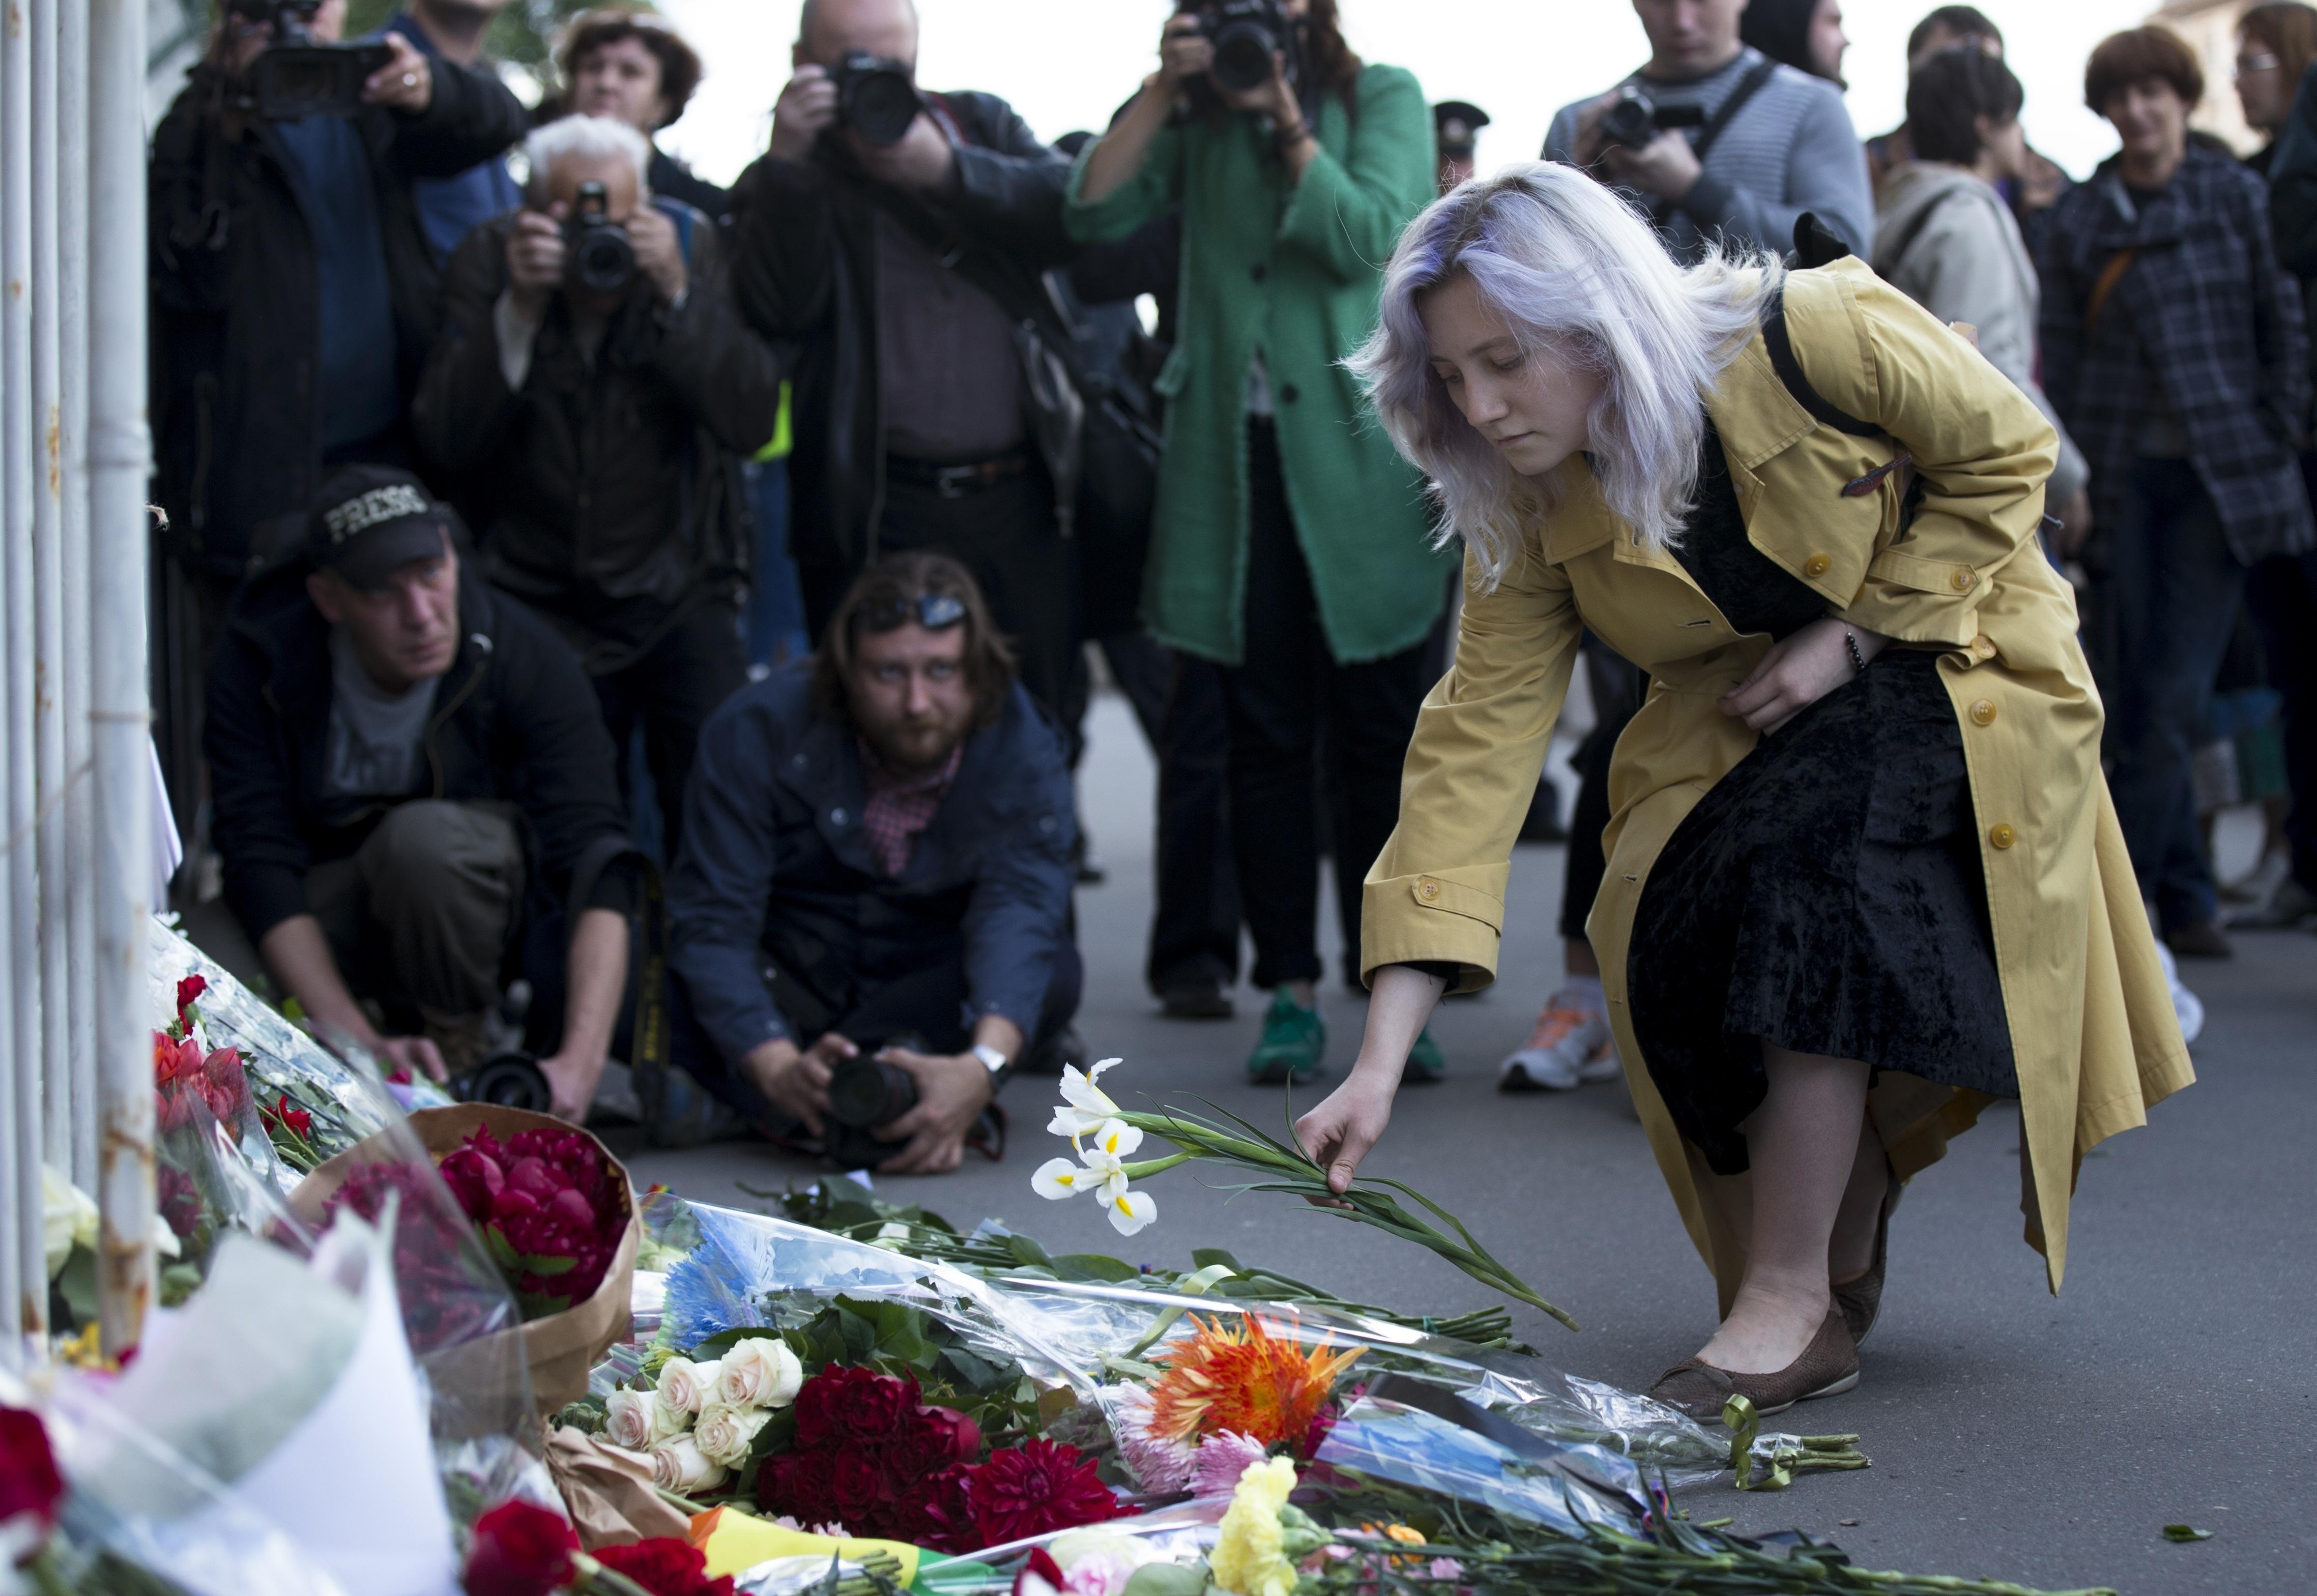 A woman lays flowers at an impromptu memorial